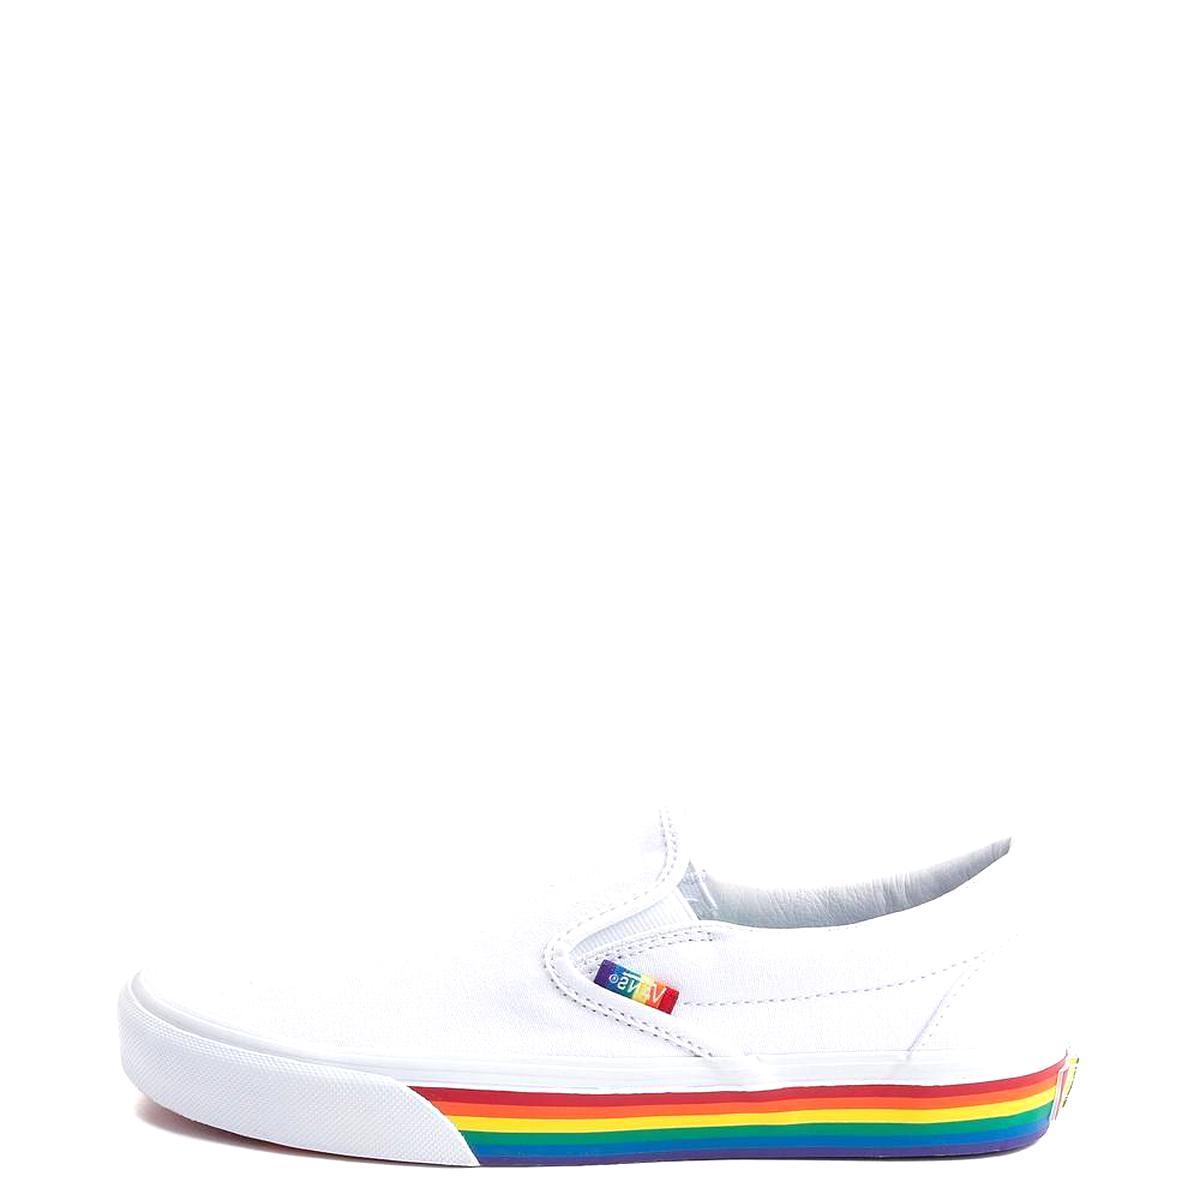 vans rainbow d'occasion